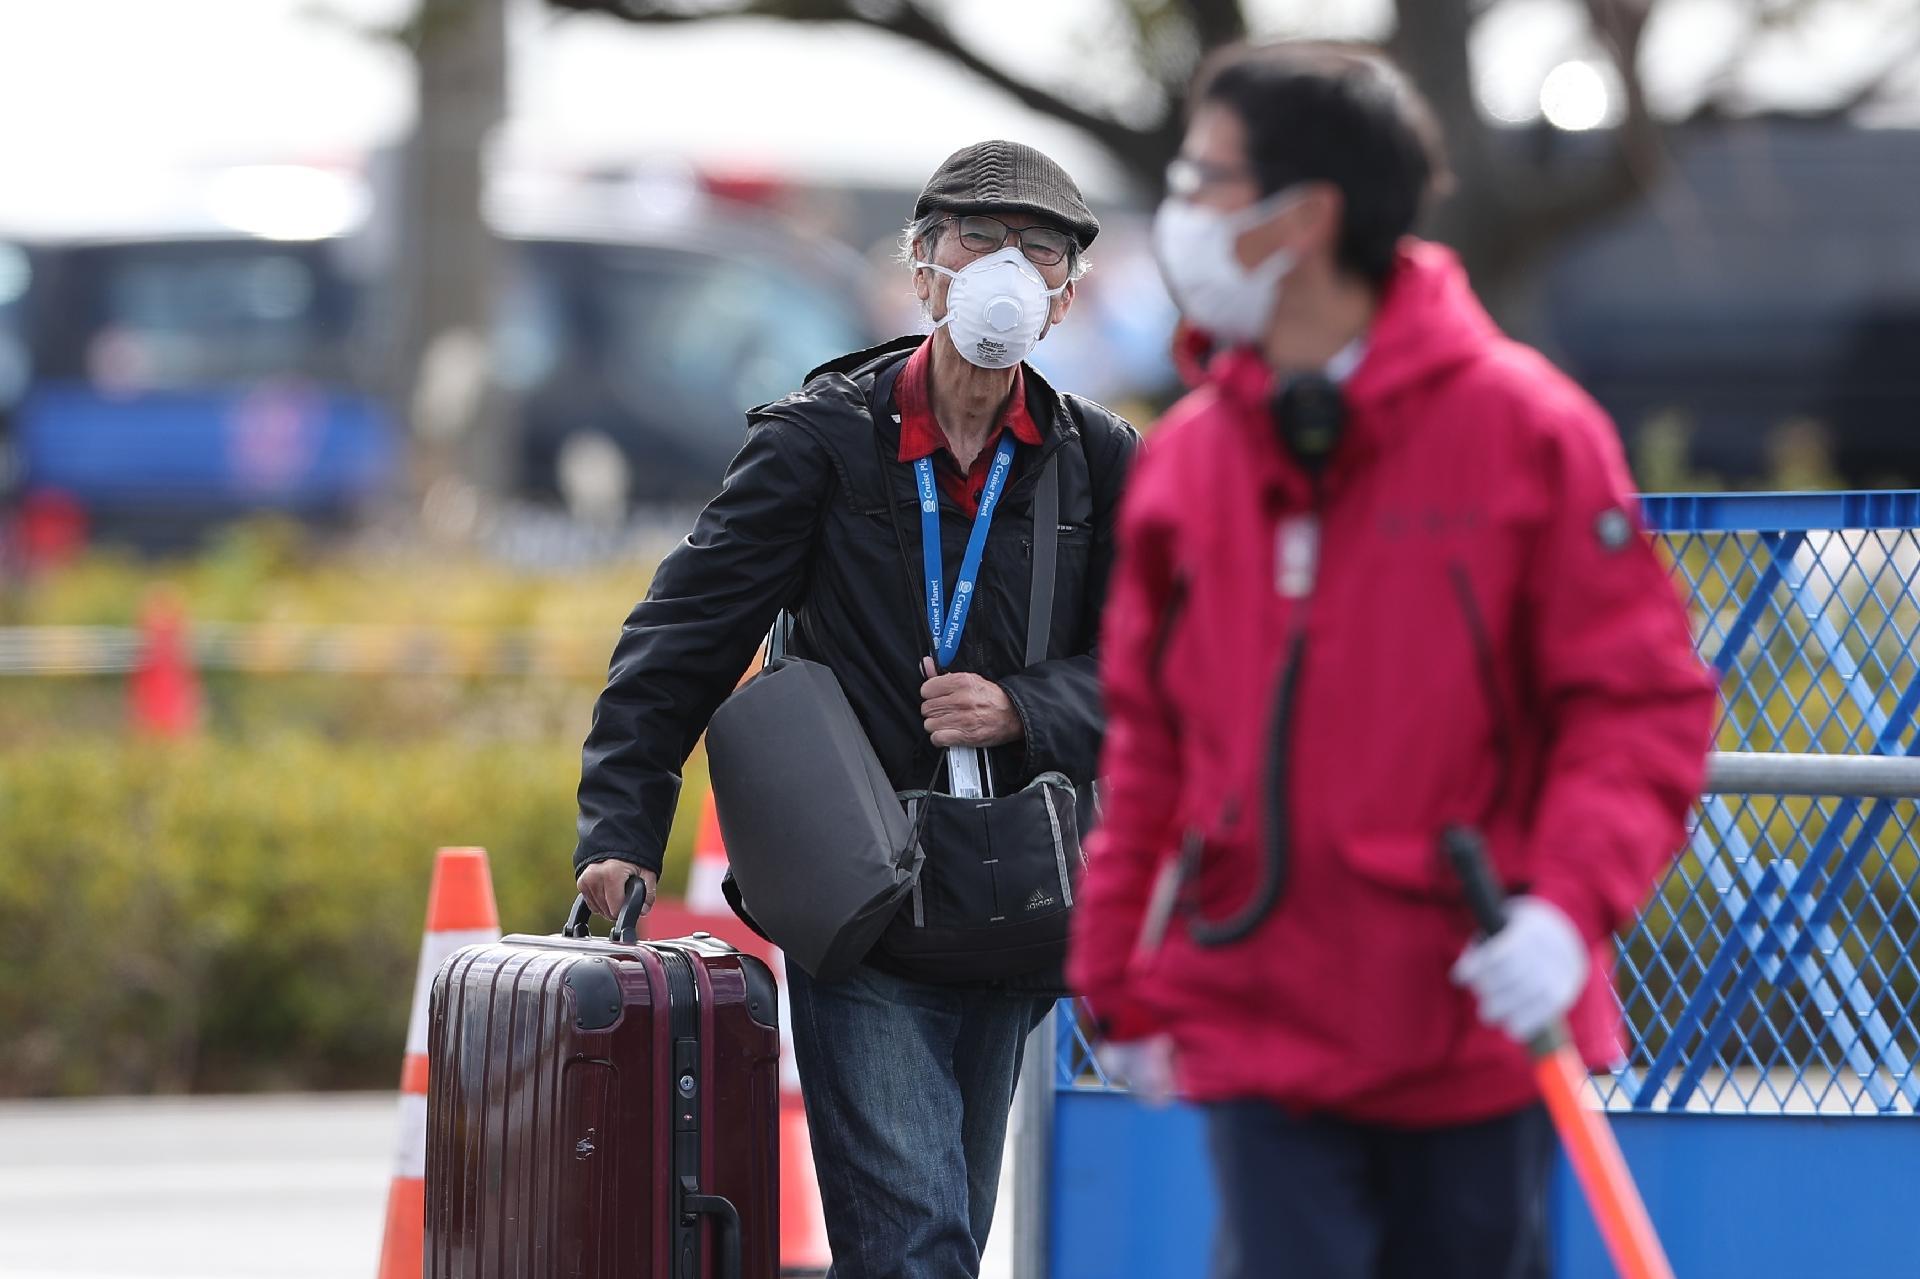 Resultado de imagem para olimpiada tokio 2020 e corona virus